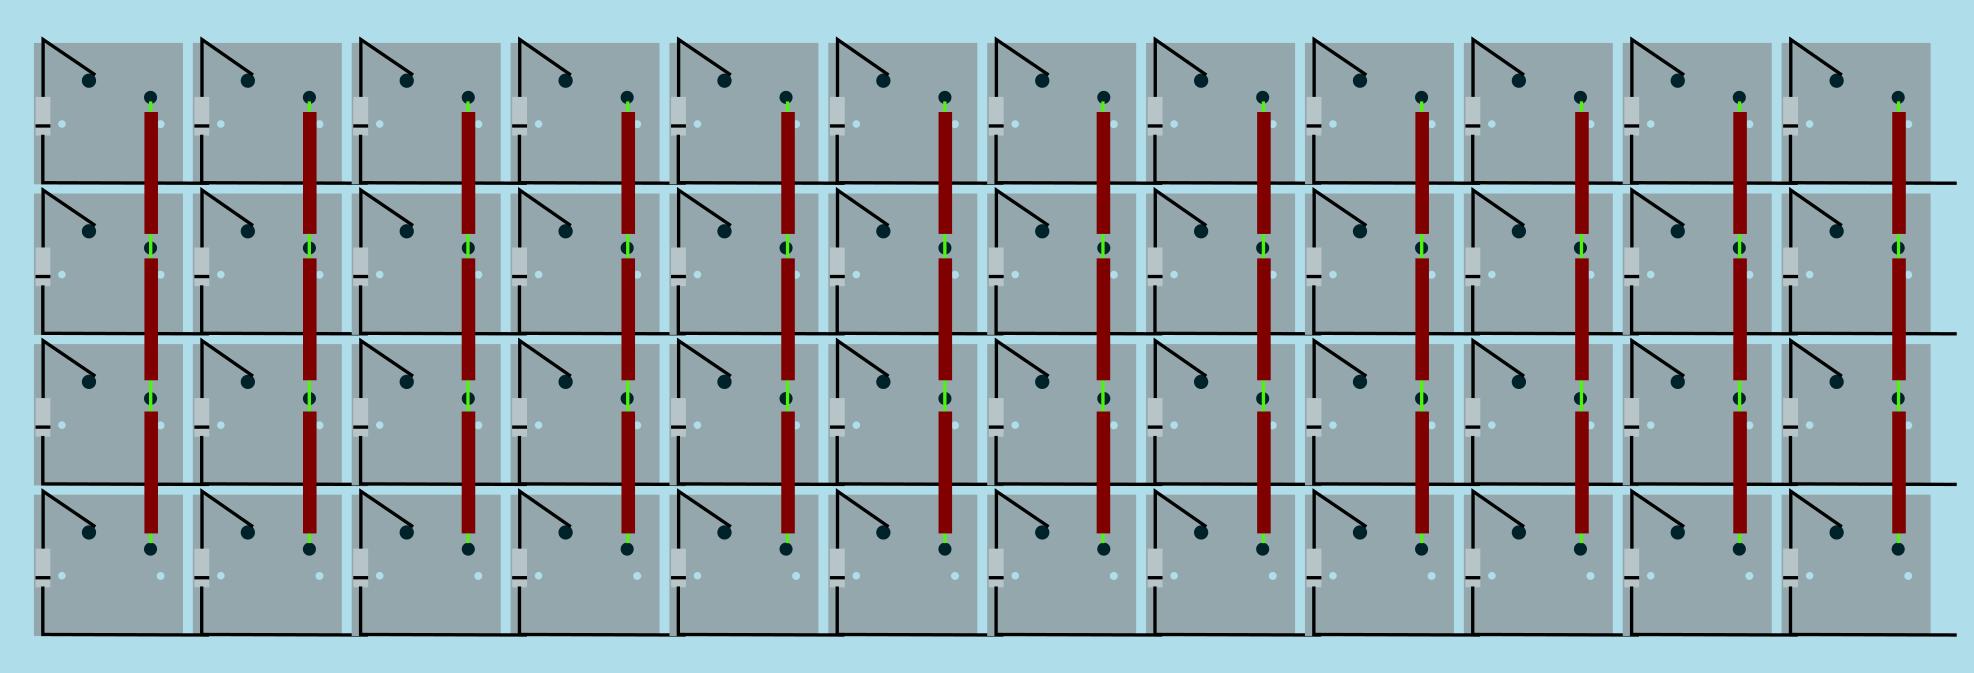 hight resolution of wiring columns